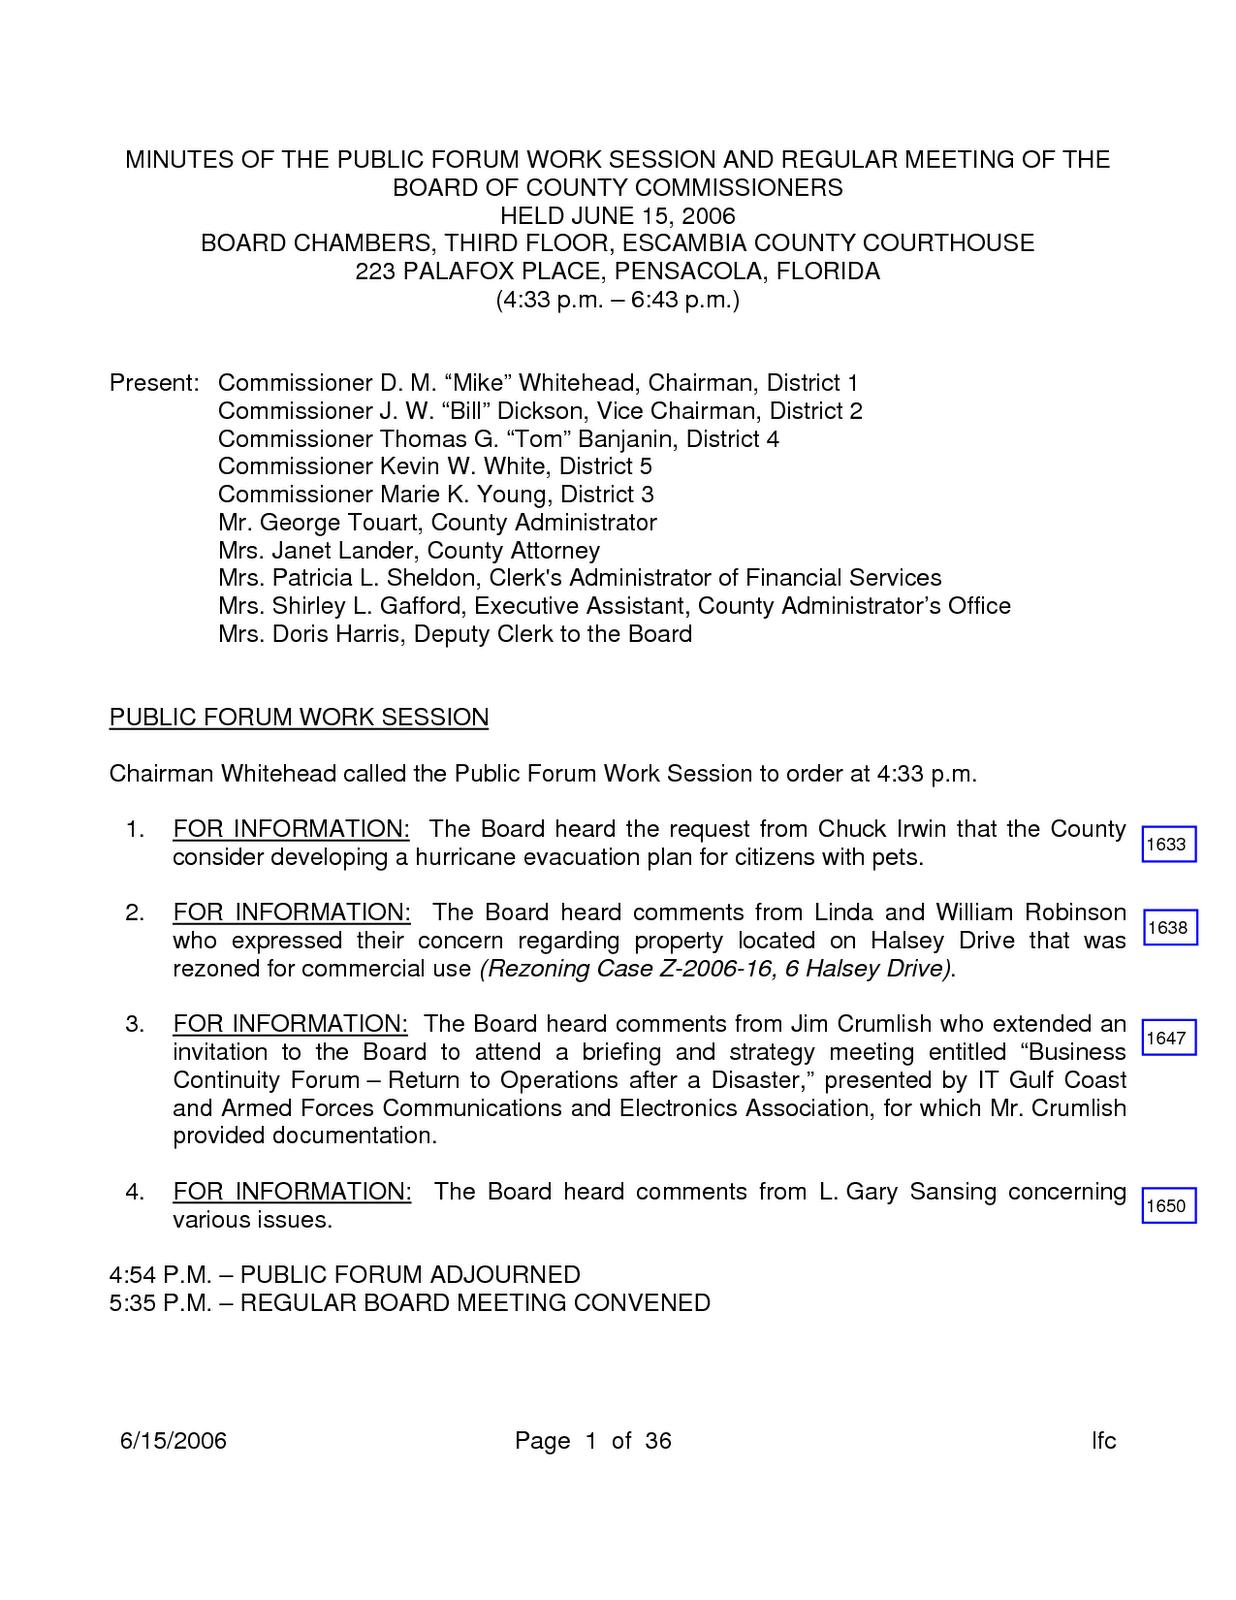 cv cv secretary resume examples unit clerk clerical resume samples resume builder cover - Clerical Resume Sample